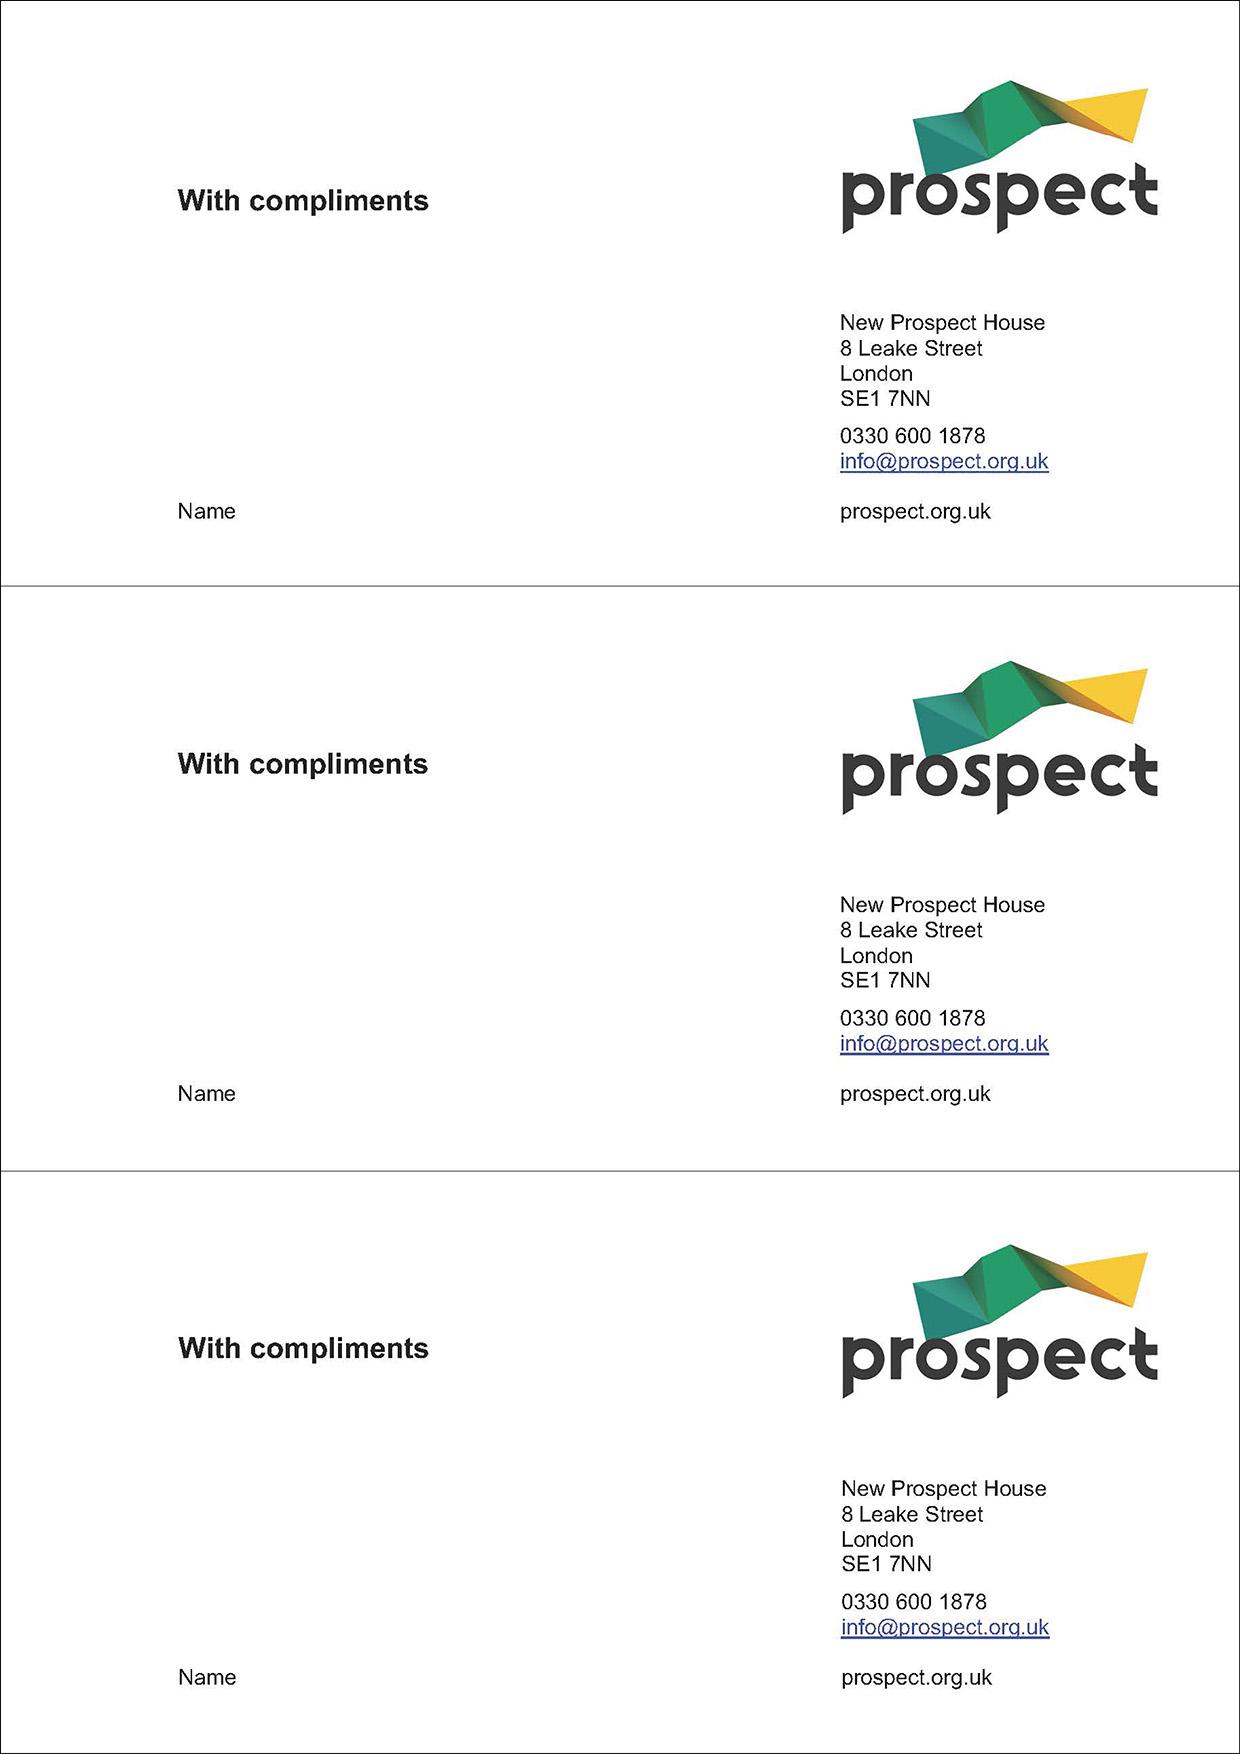 Prospect comp slip